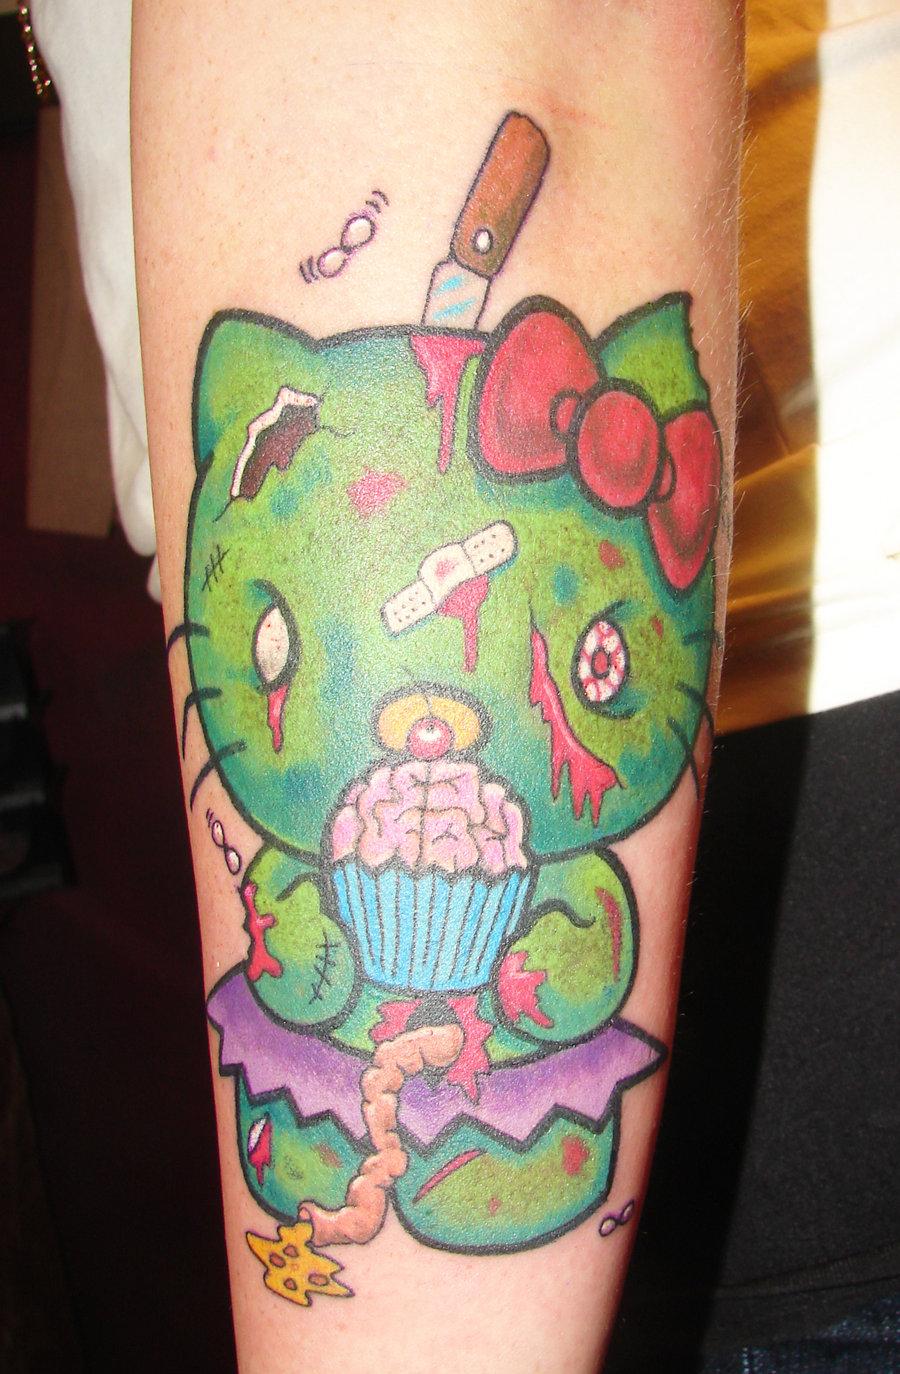 hello-kitty-zombie-cupcake jpg  Evil Hello Kitty Tattoo